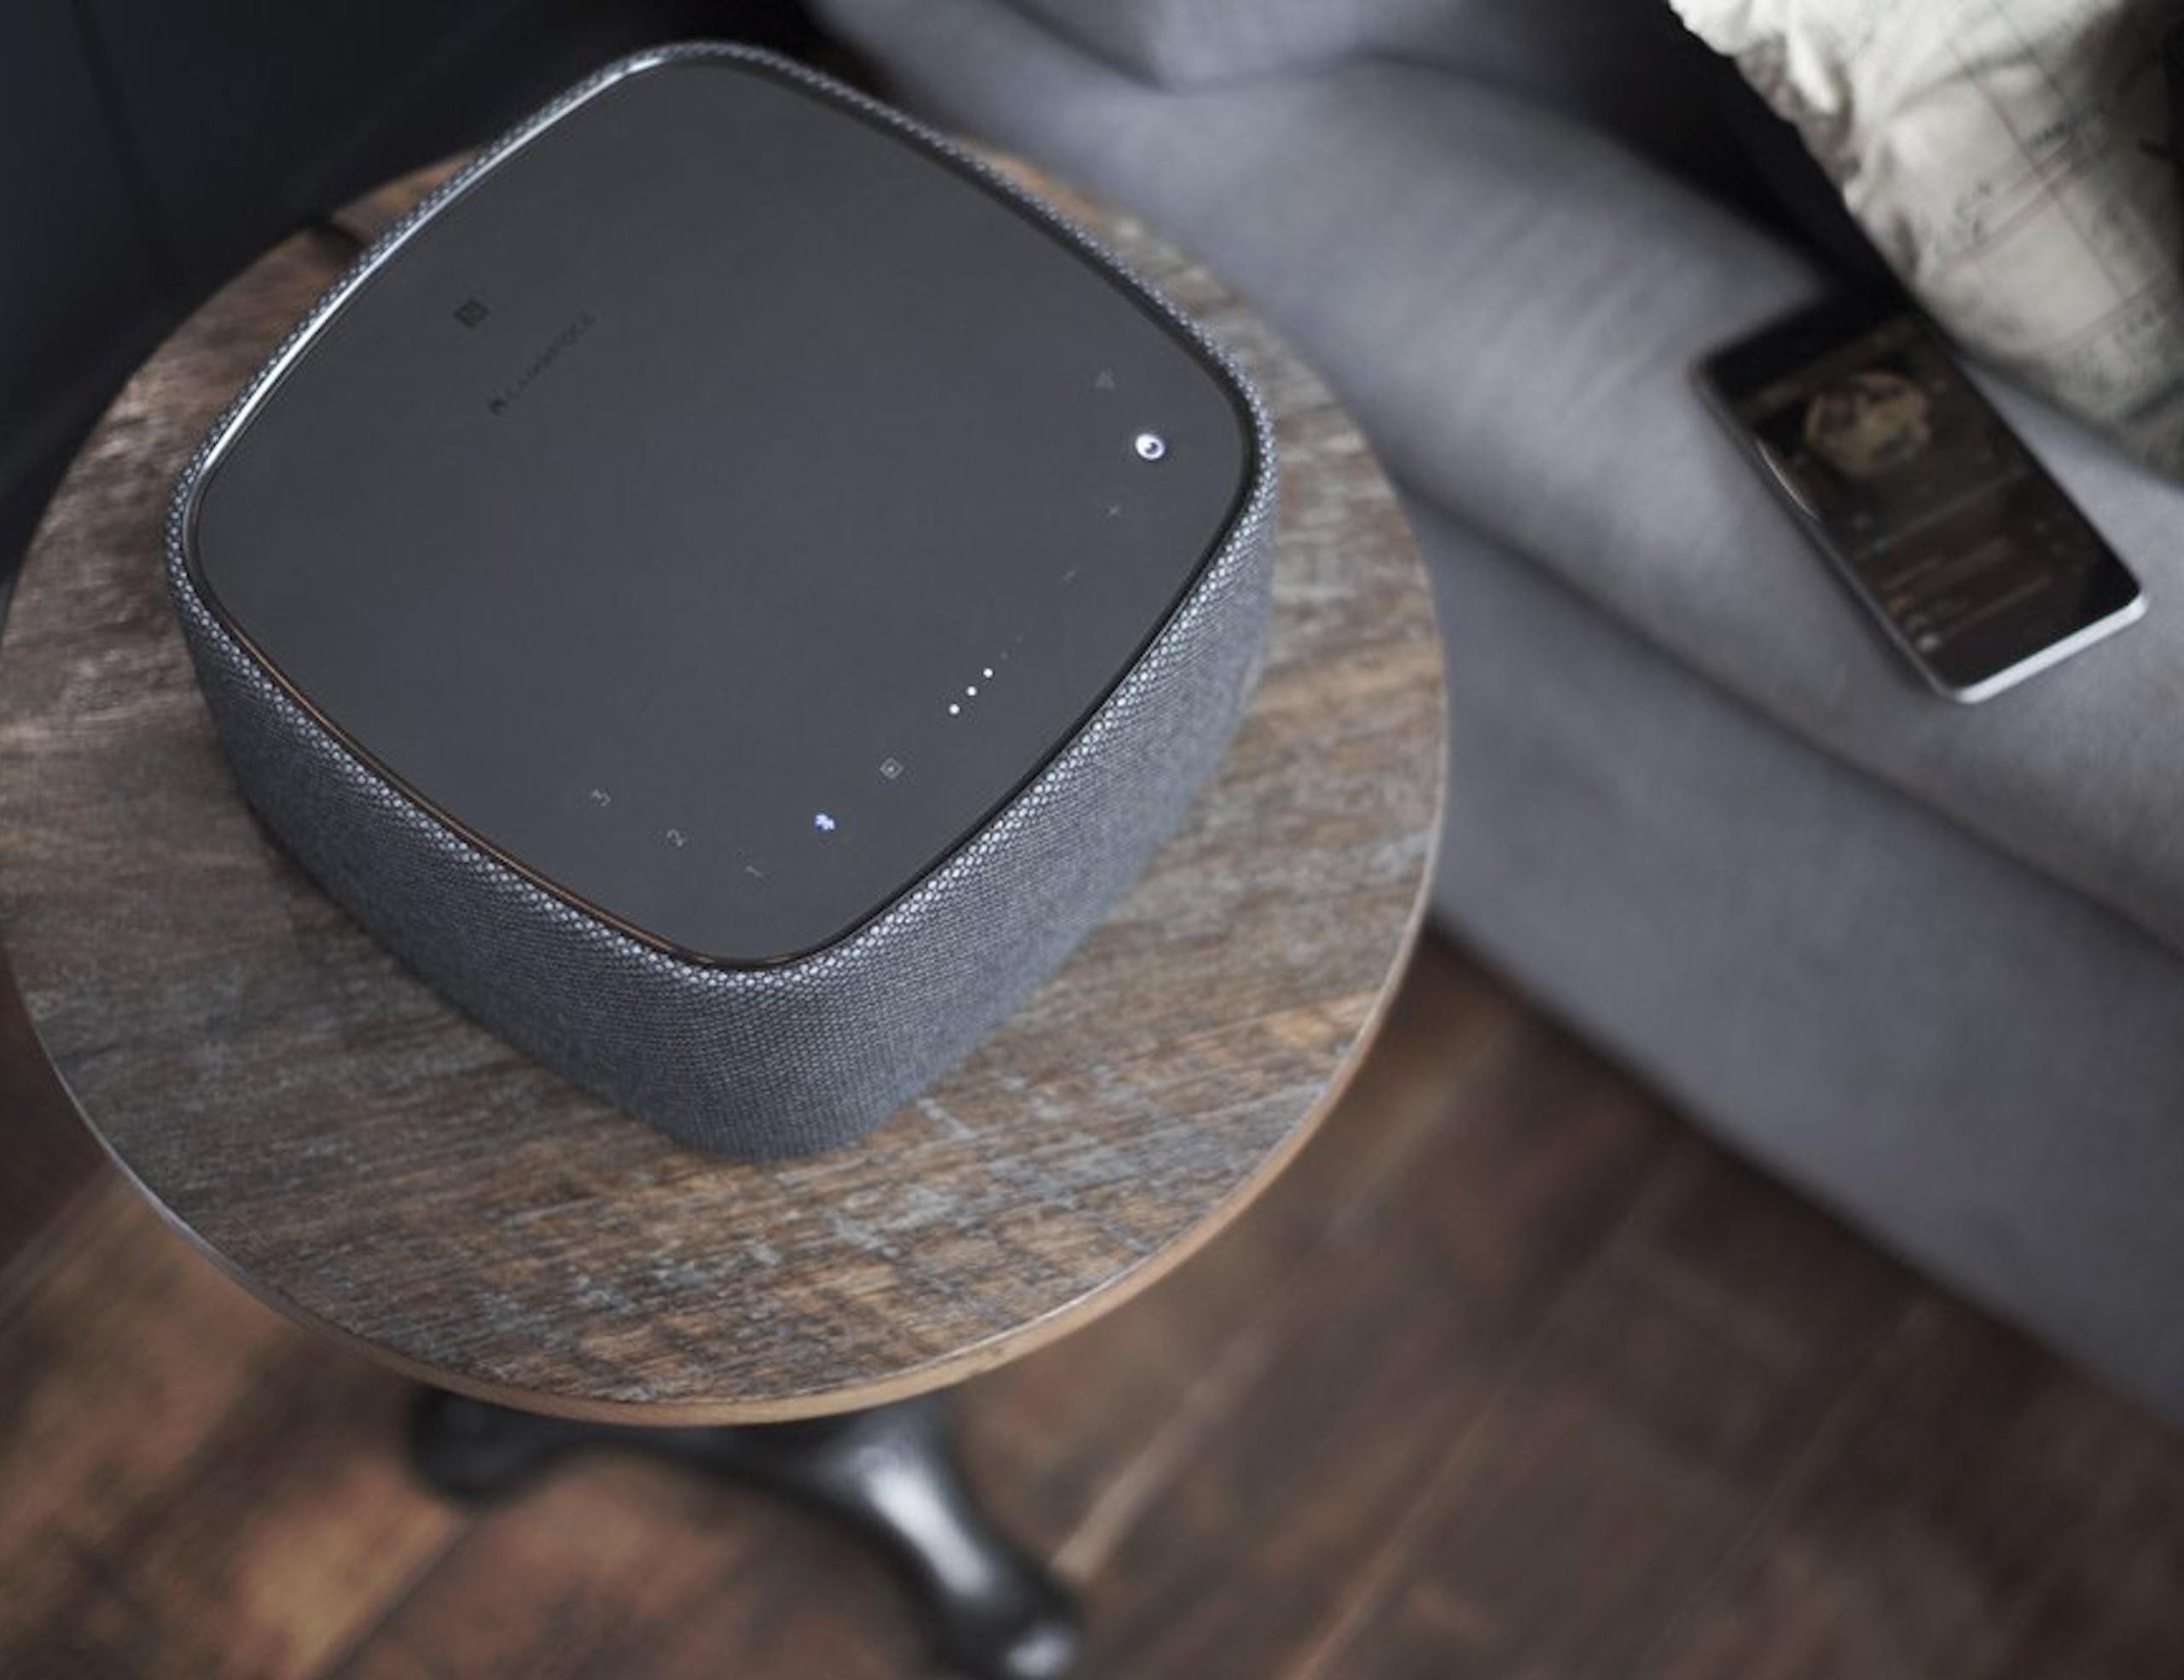 Cambridge Audio Yoyo L All-In-One Home Audio System